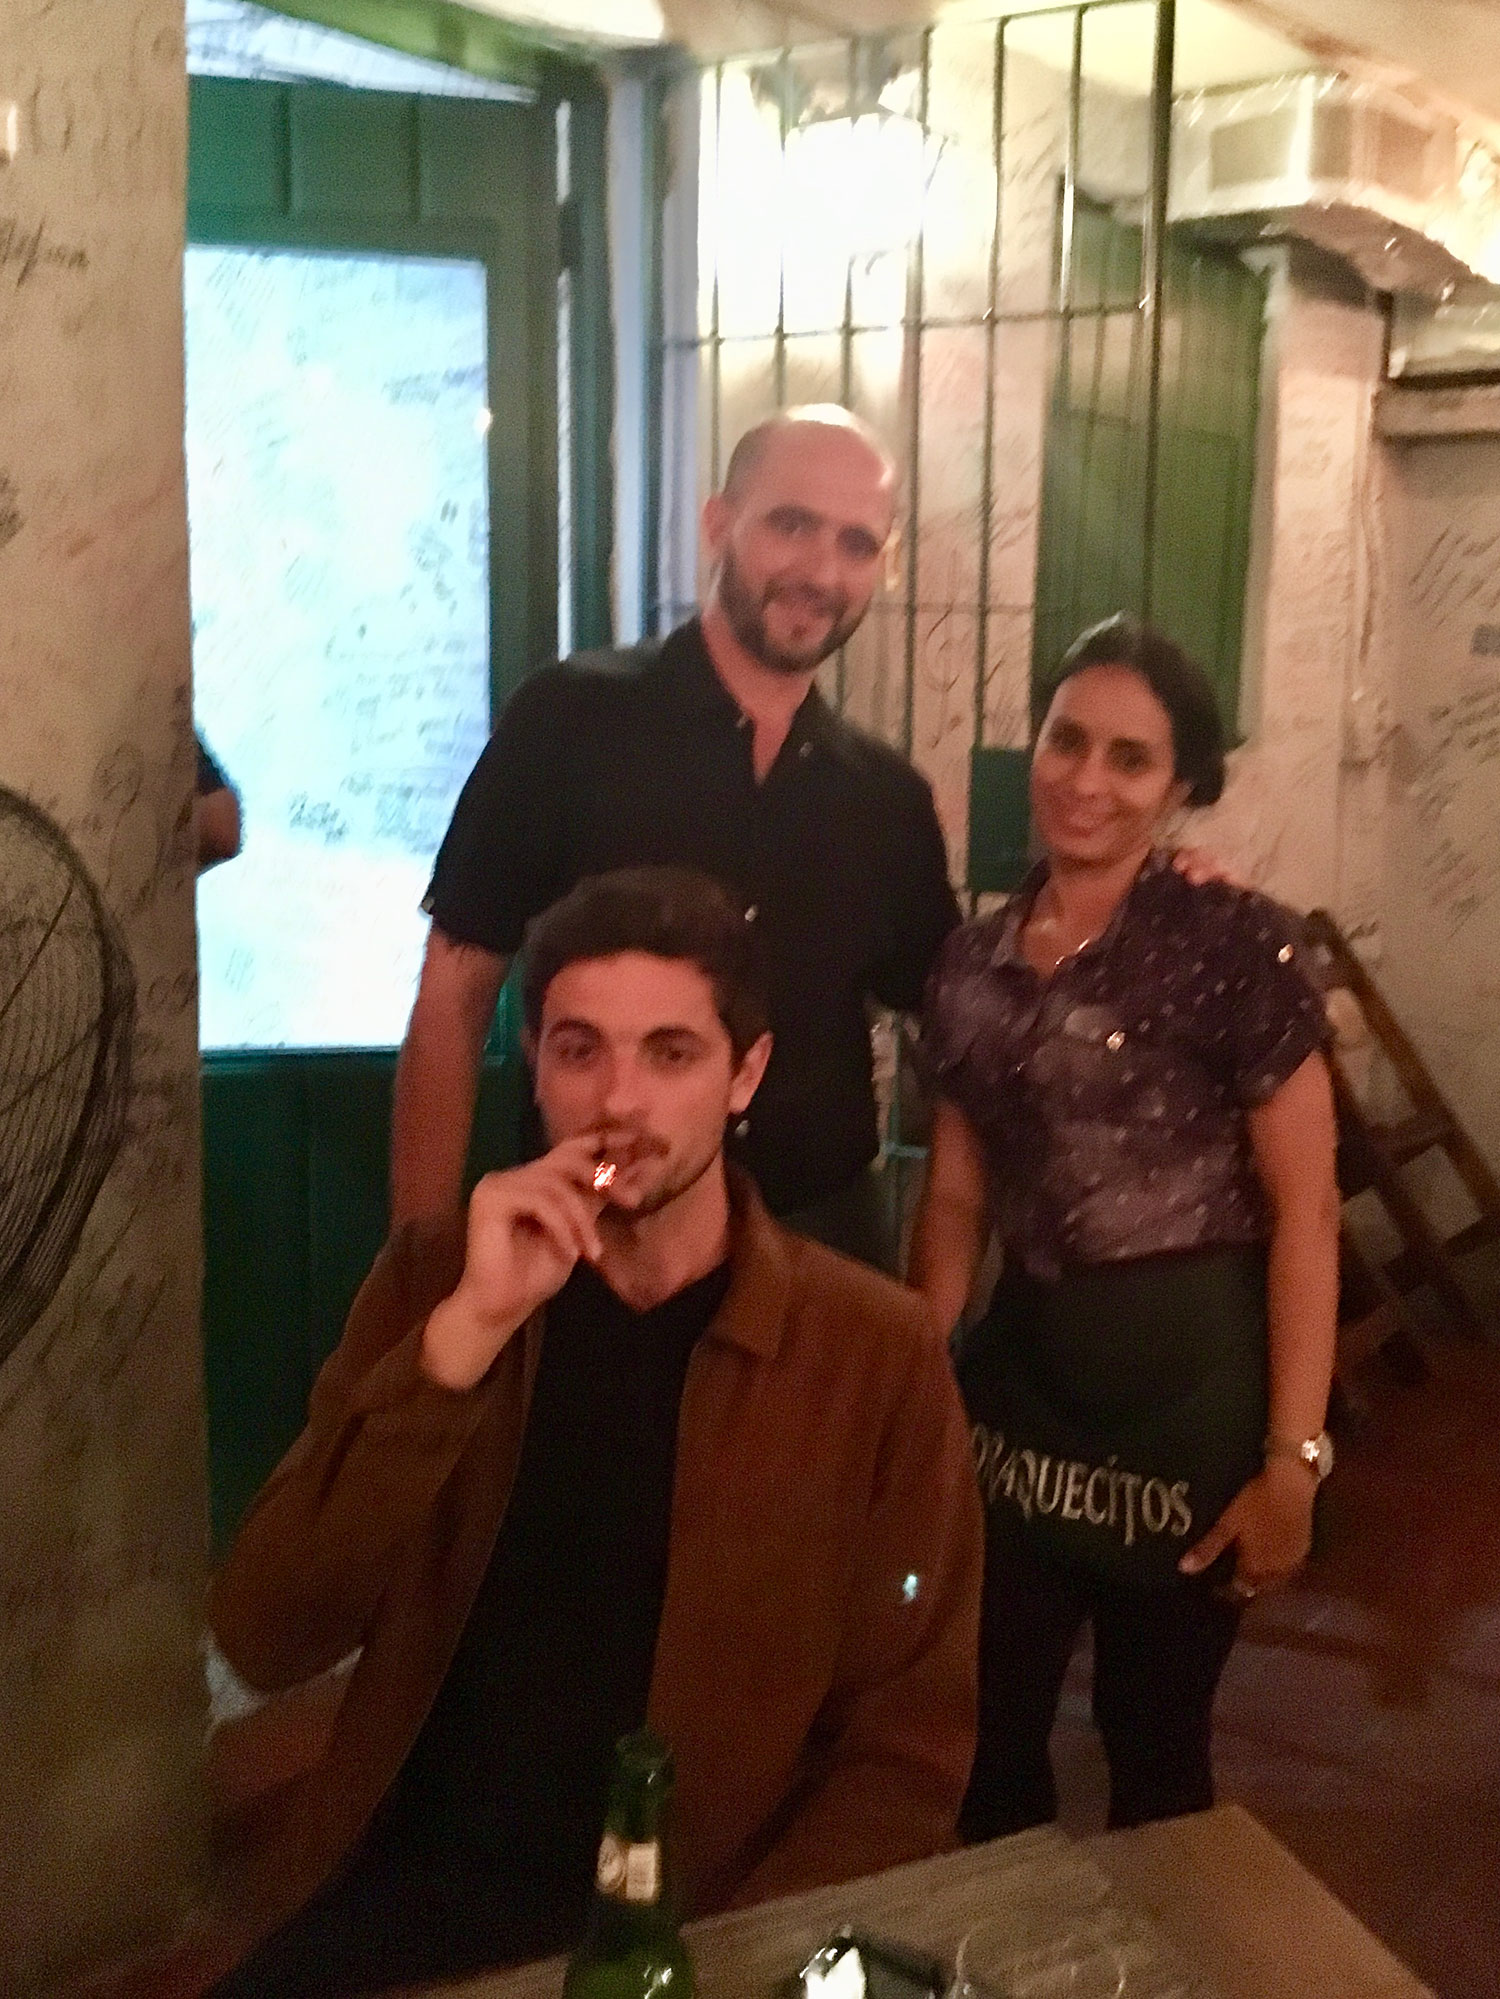 Rhodri smoking a cigar at Draquecitos. With Alexis and his partner.